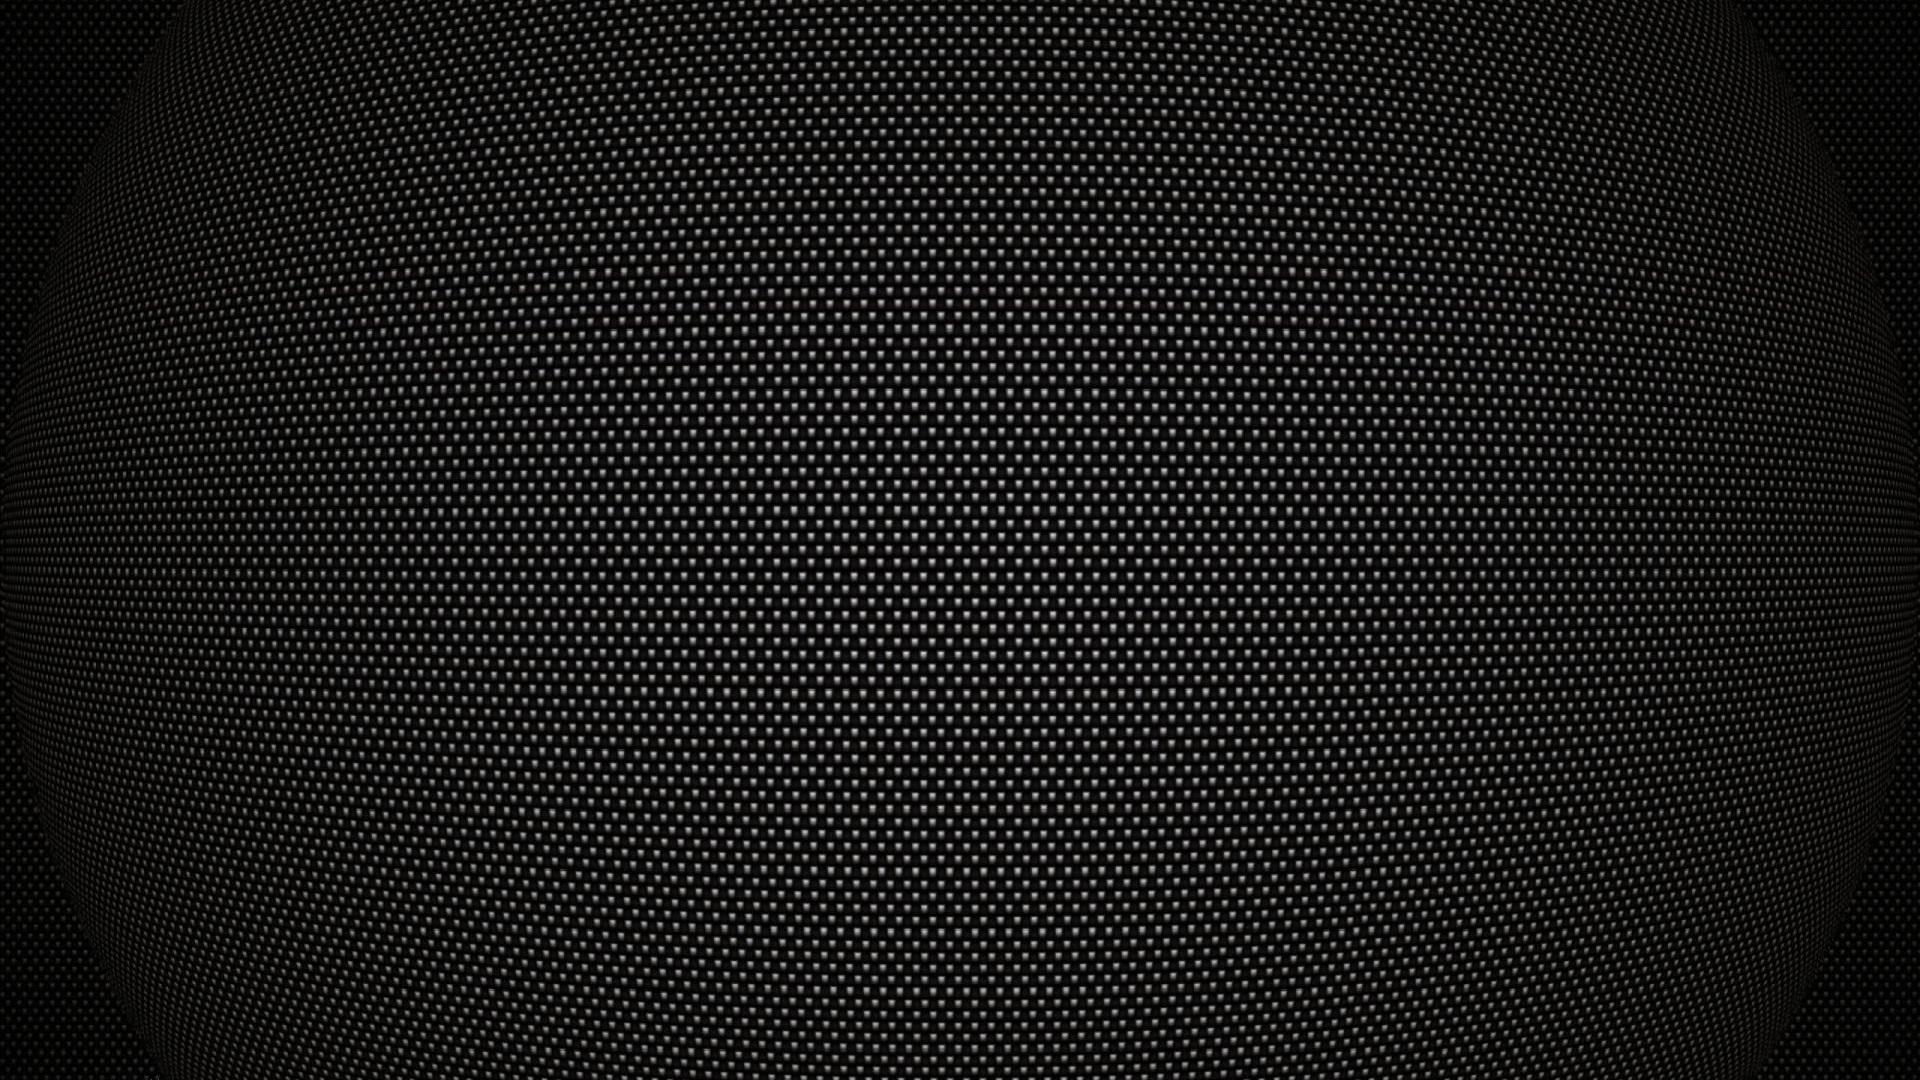 Plain Black Wallpapers HD 1920x1080